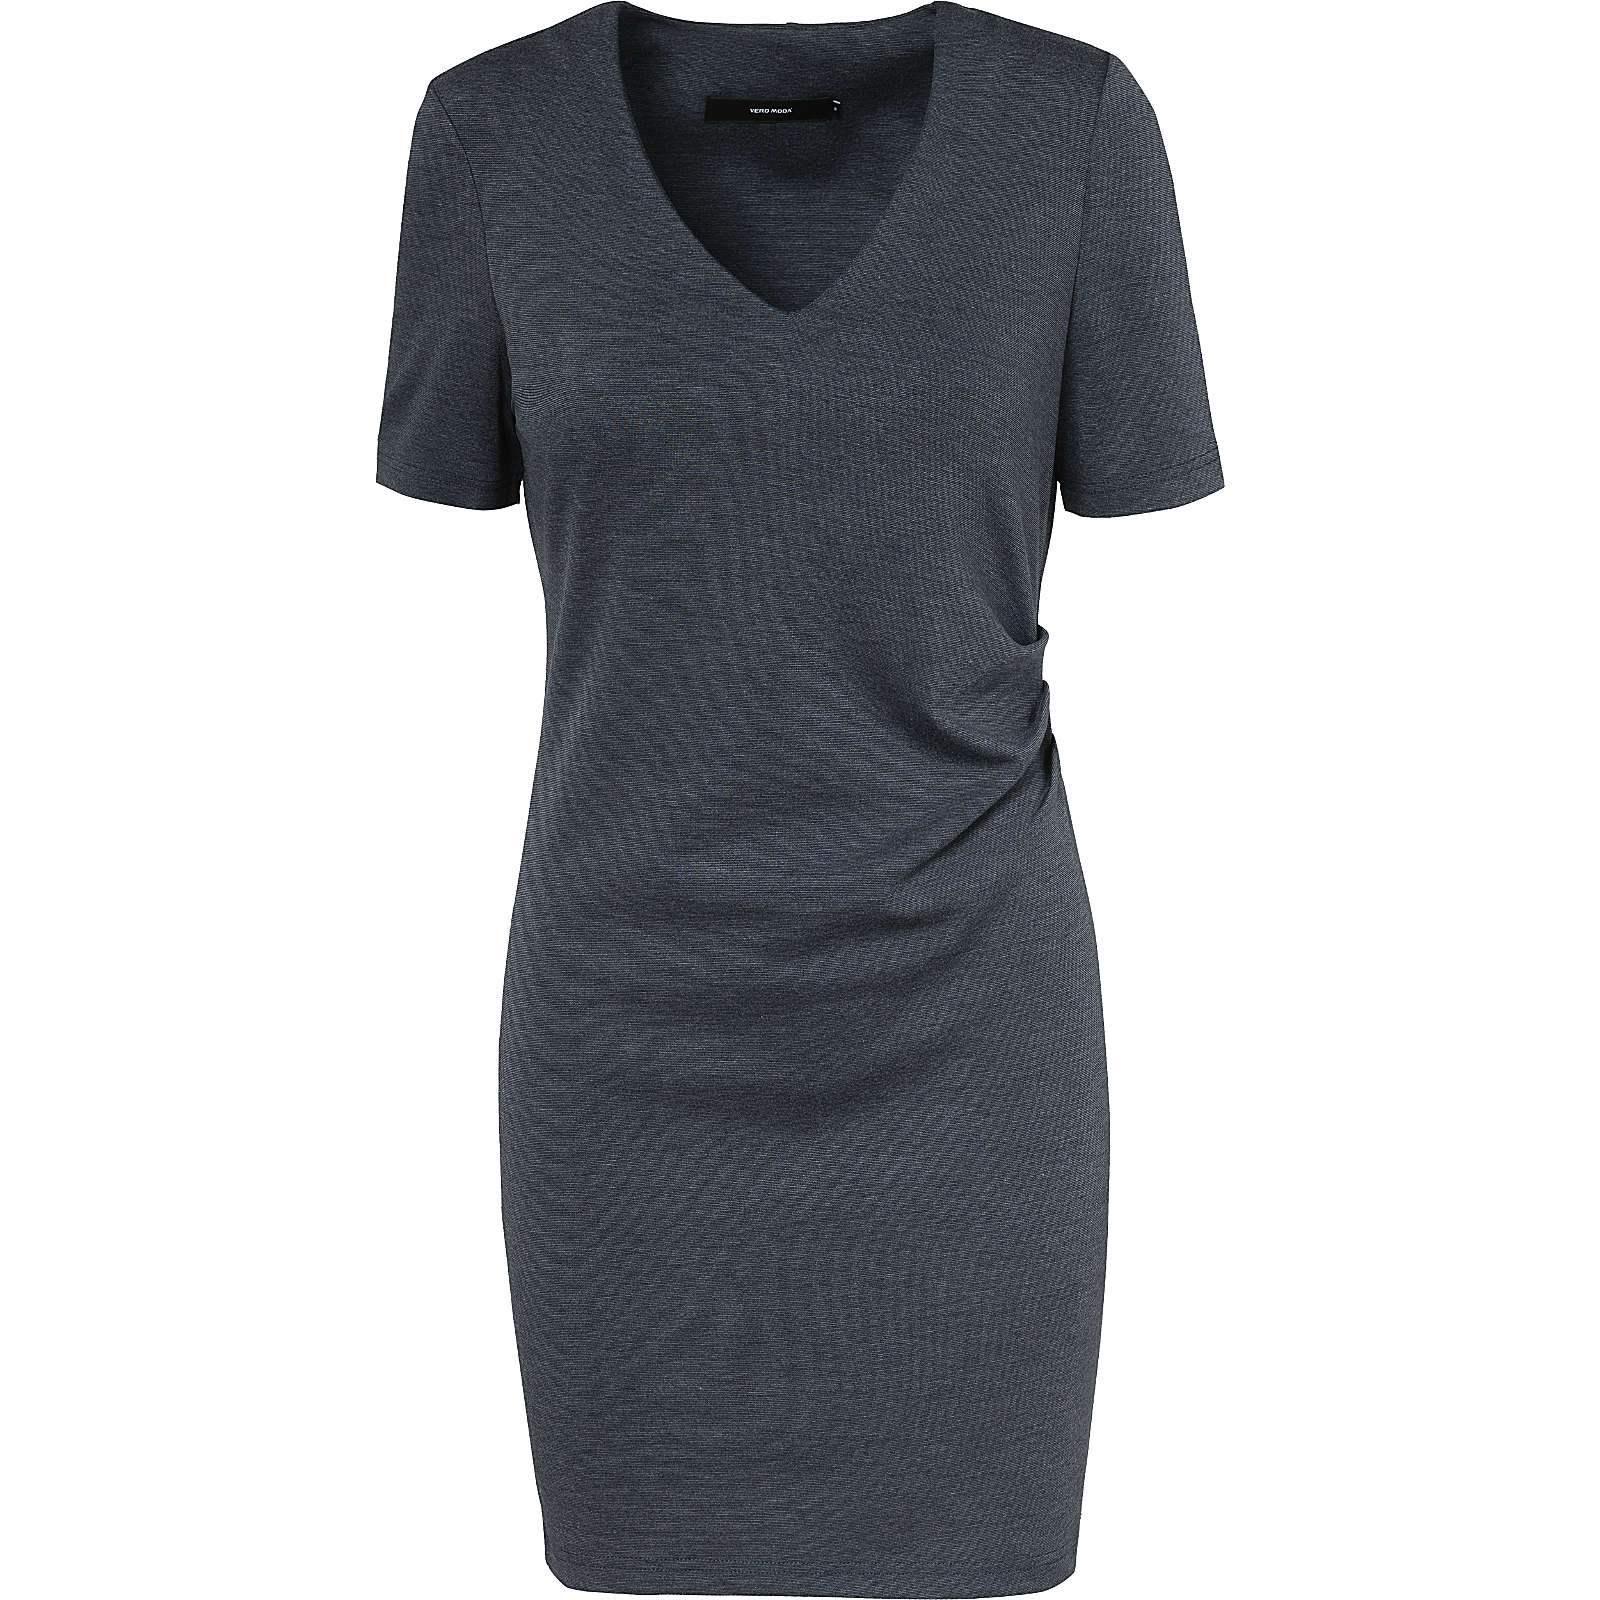 VERO MODA VMJENNY 2/4 SHORT DRESS - Kleider* - weiblich dunkelblau Damen Gr. 34